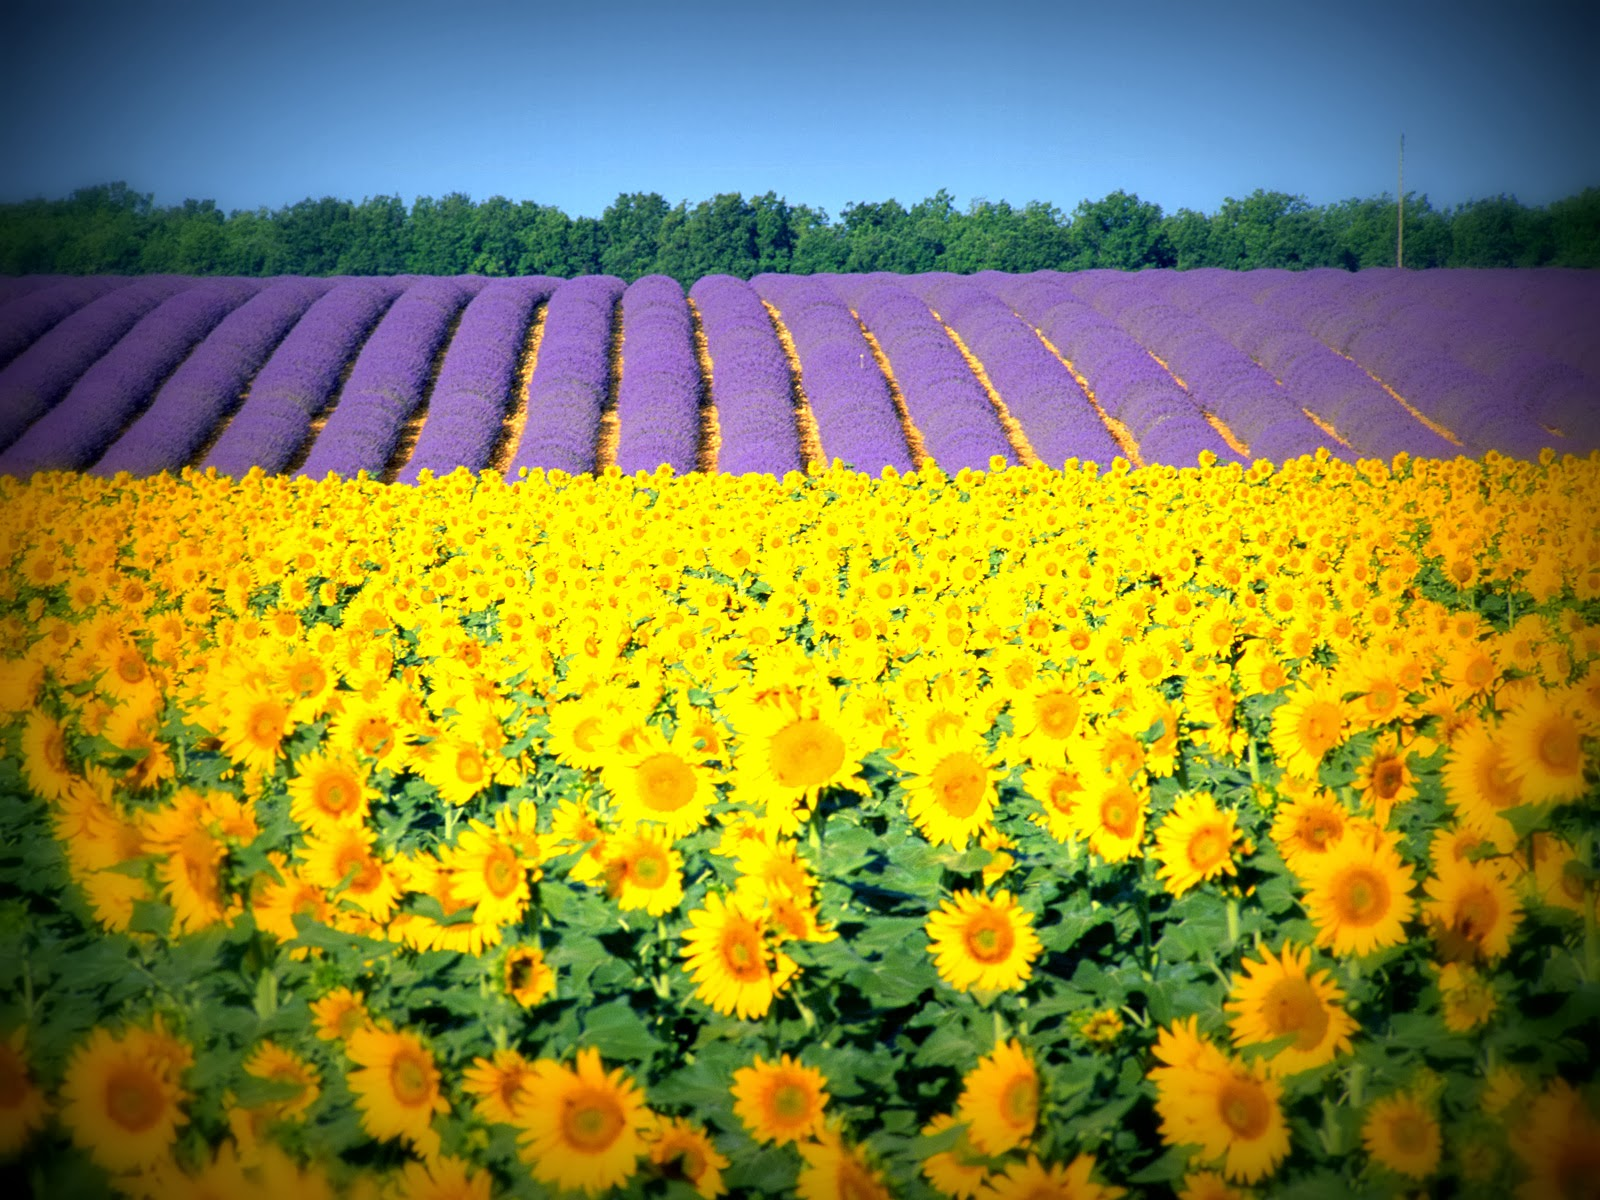 sunflower fields 2 by - photo #4